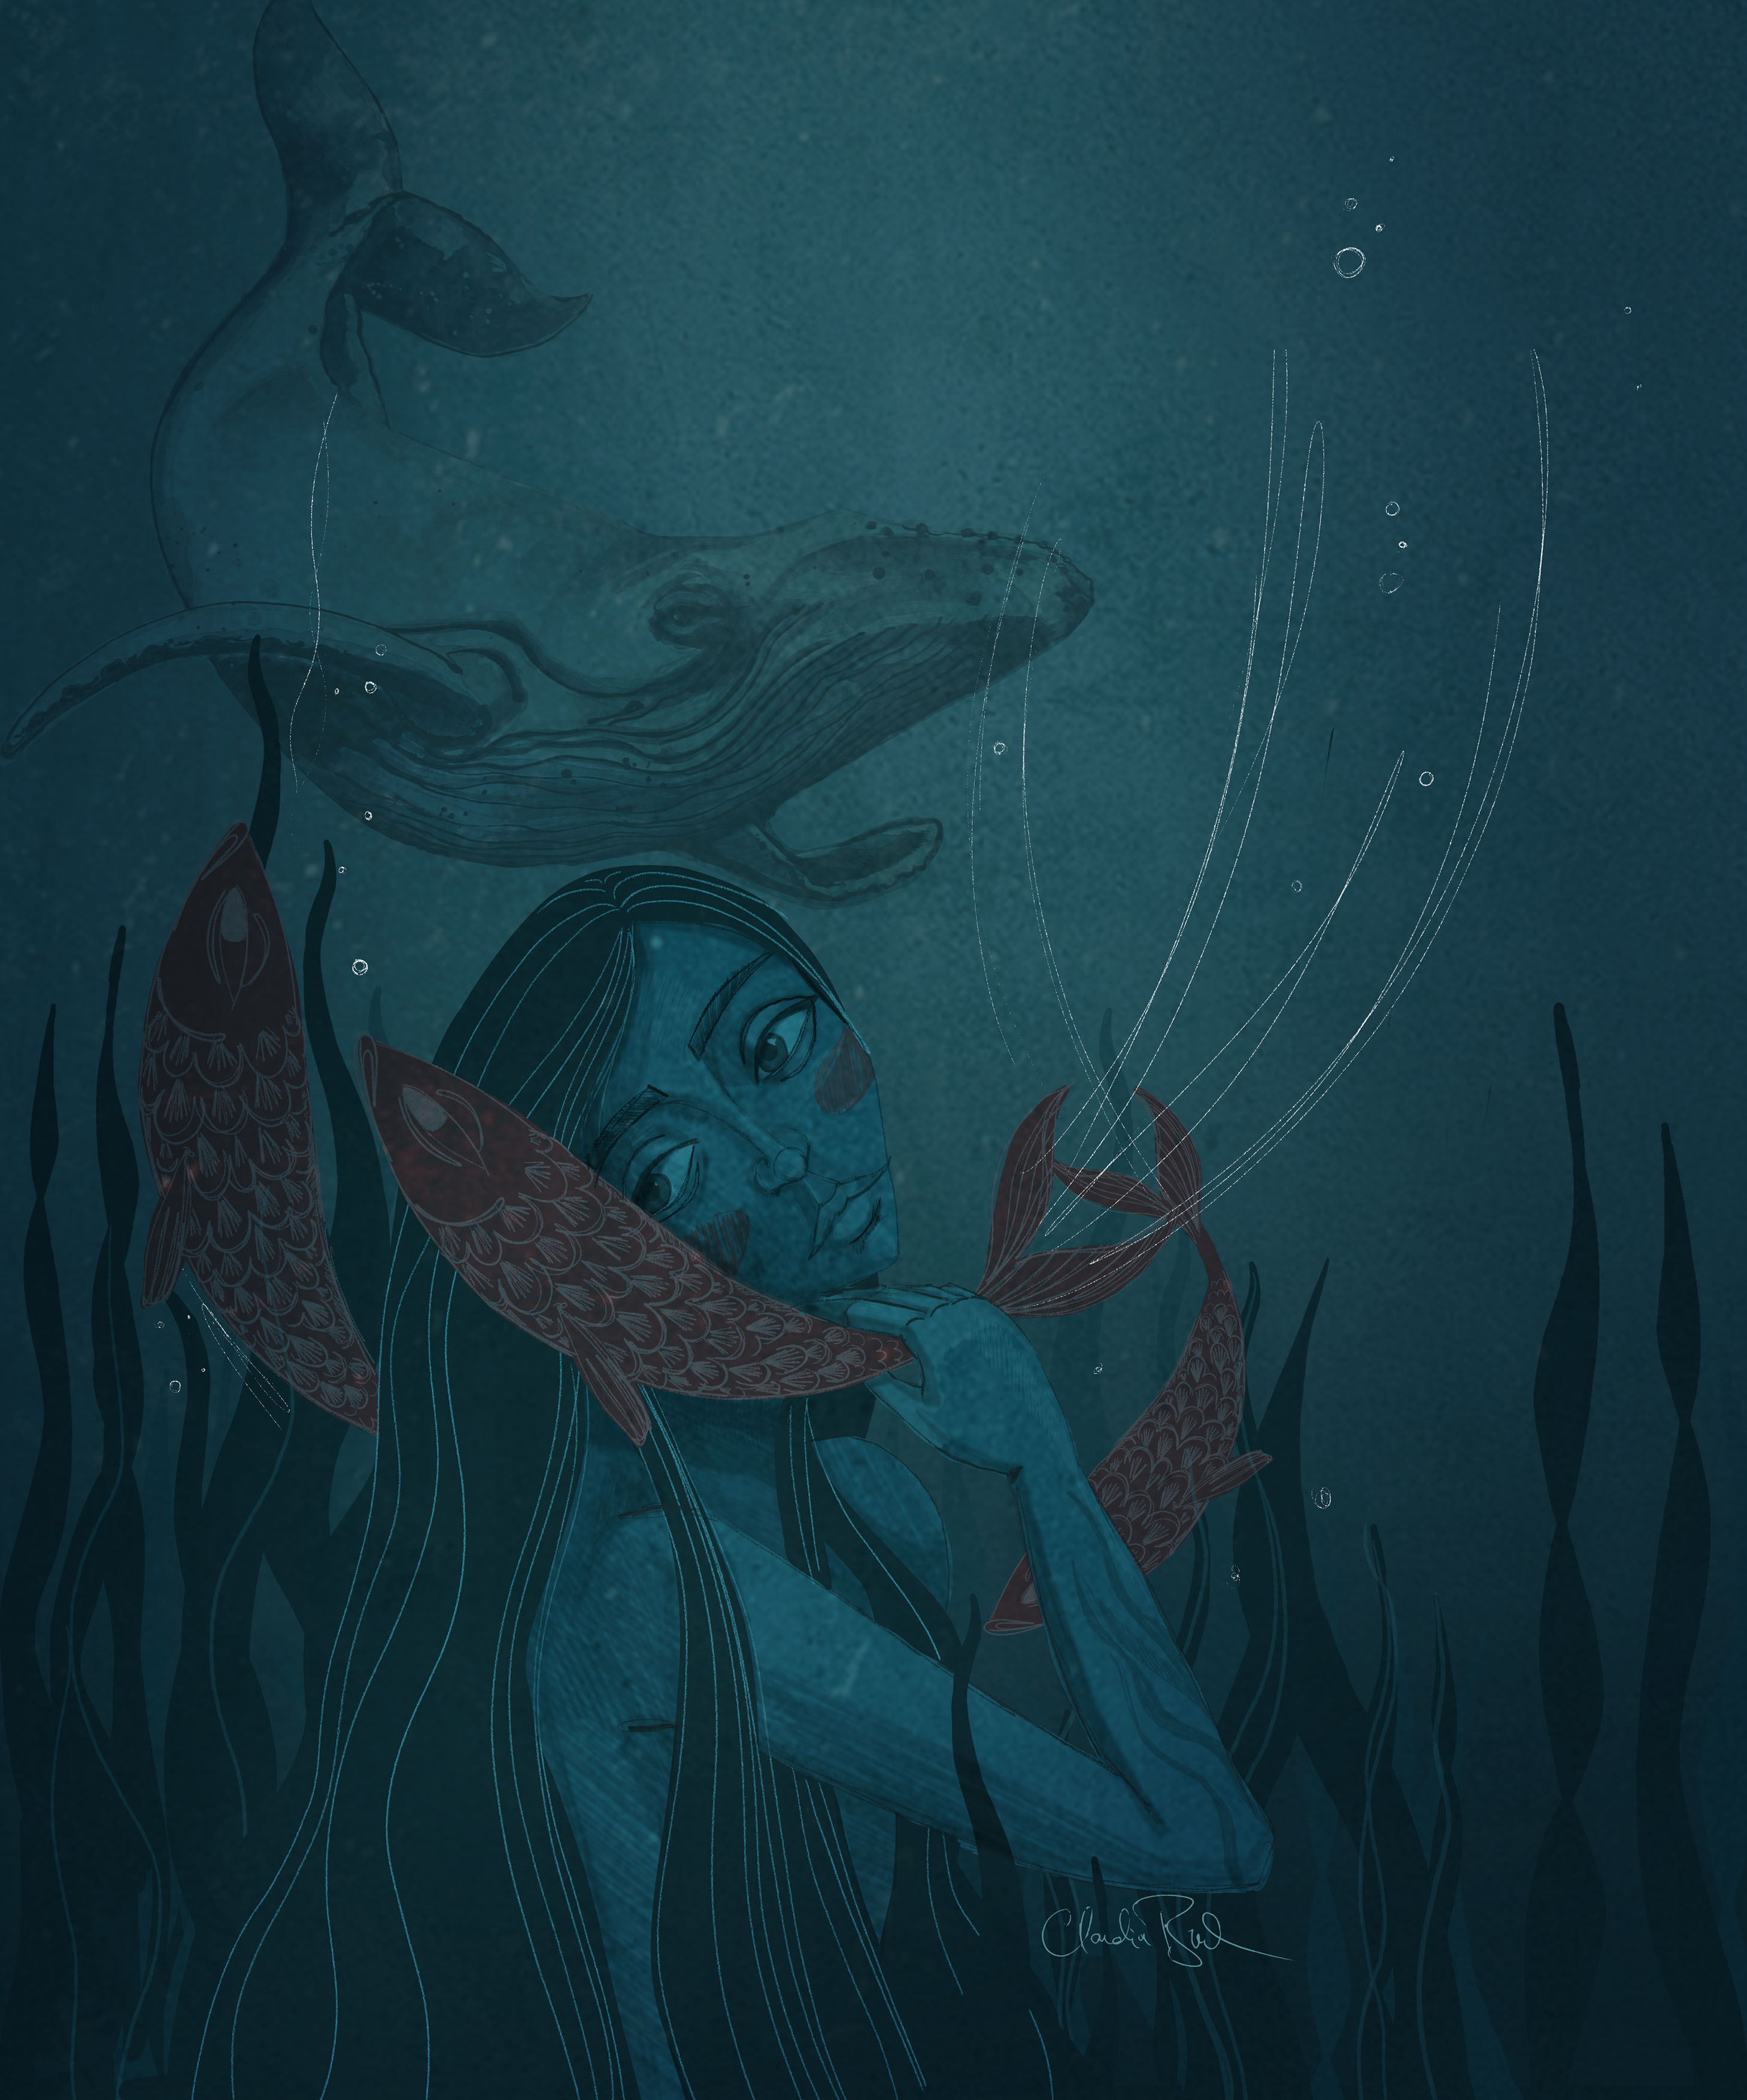 CBucek_Underwater-small